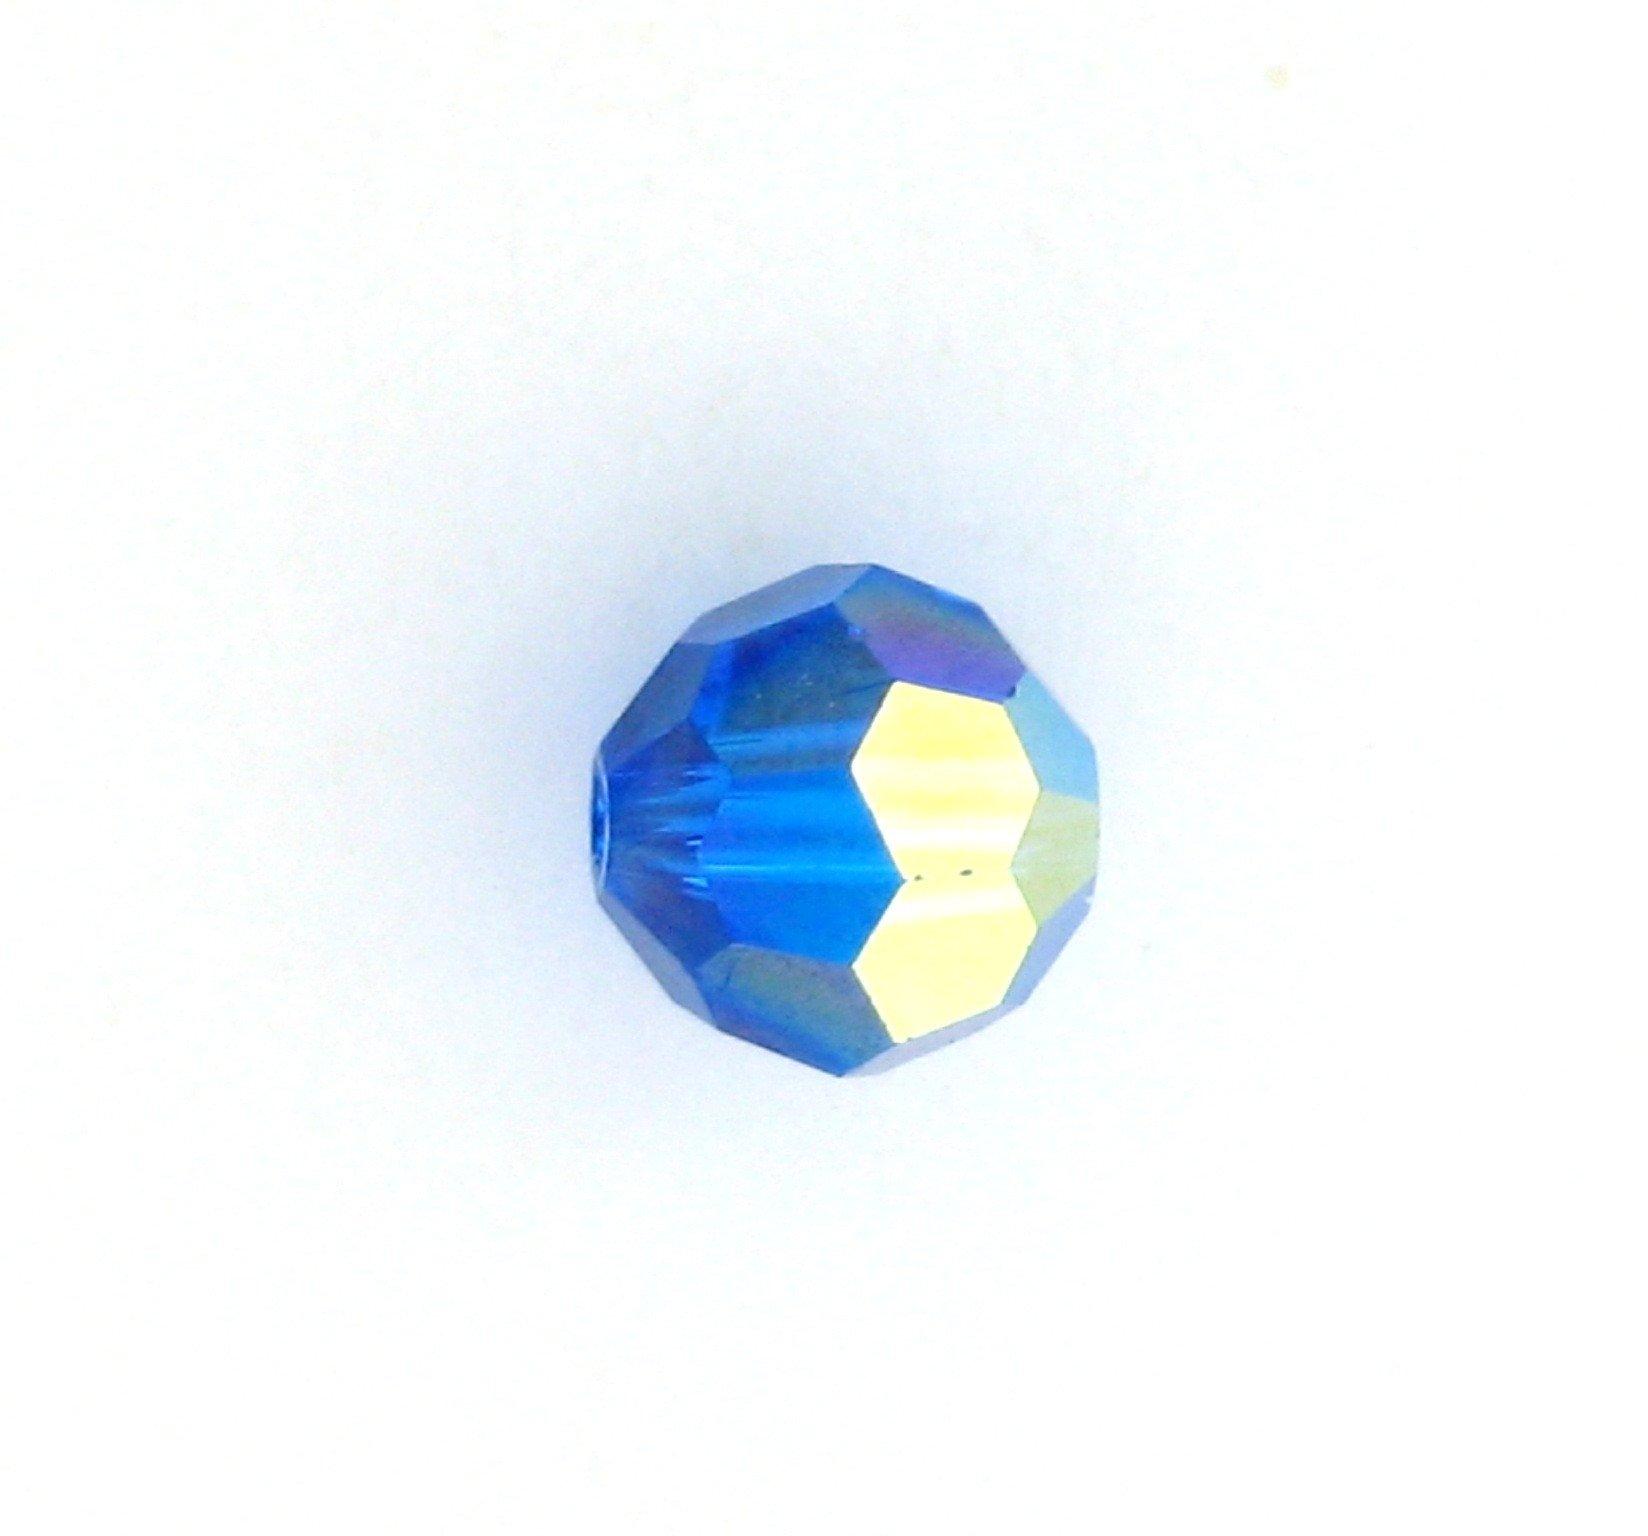 2e2fbe18f 5000 - 8mm Swarovski Round Crystal - Capri Blue AB   Crystal Findings